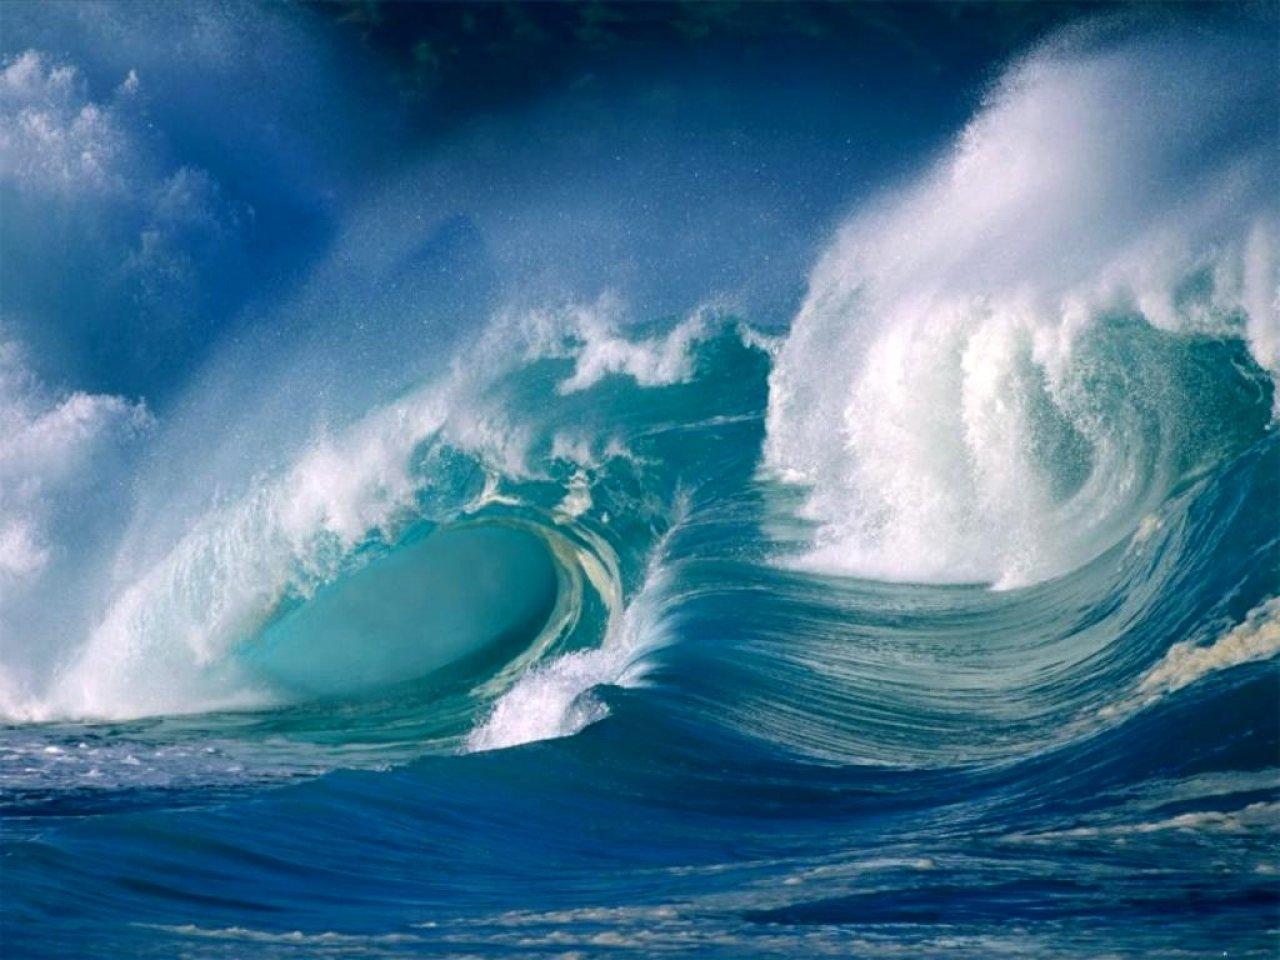 Crushing Ocean Waves Nature computer desktop wallpapers 1280x960